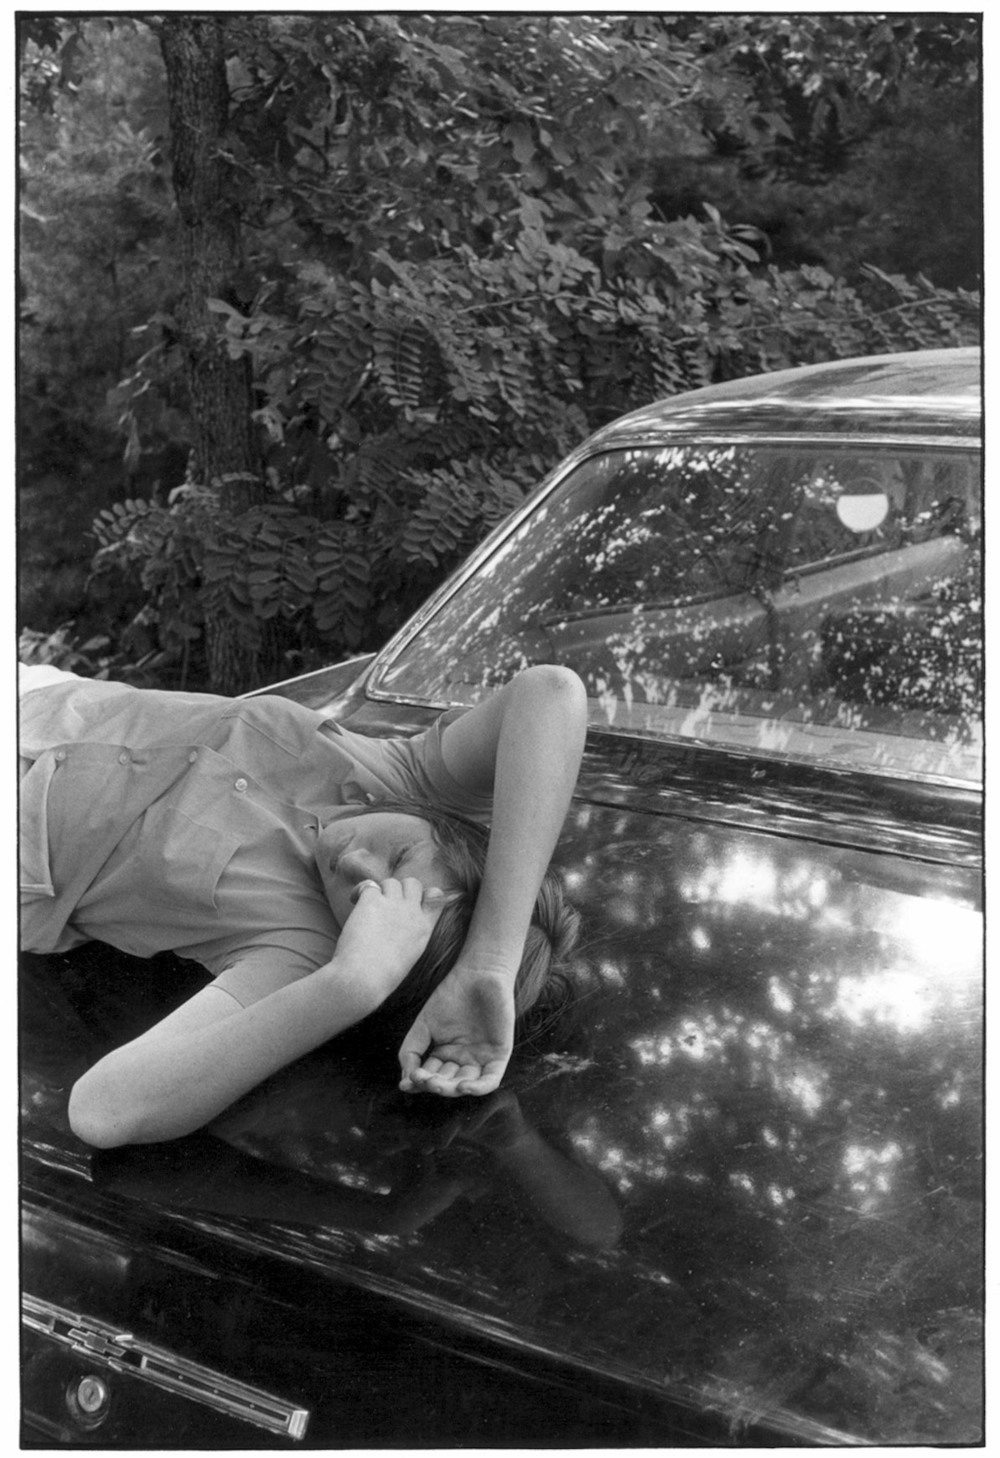 Girl lying on trunk of a car, 1972.©Duke University David M. Rubenstein Rare Book & Manuscript Library